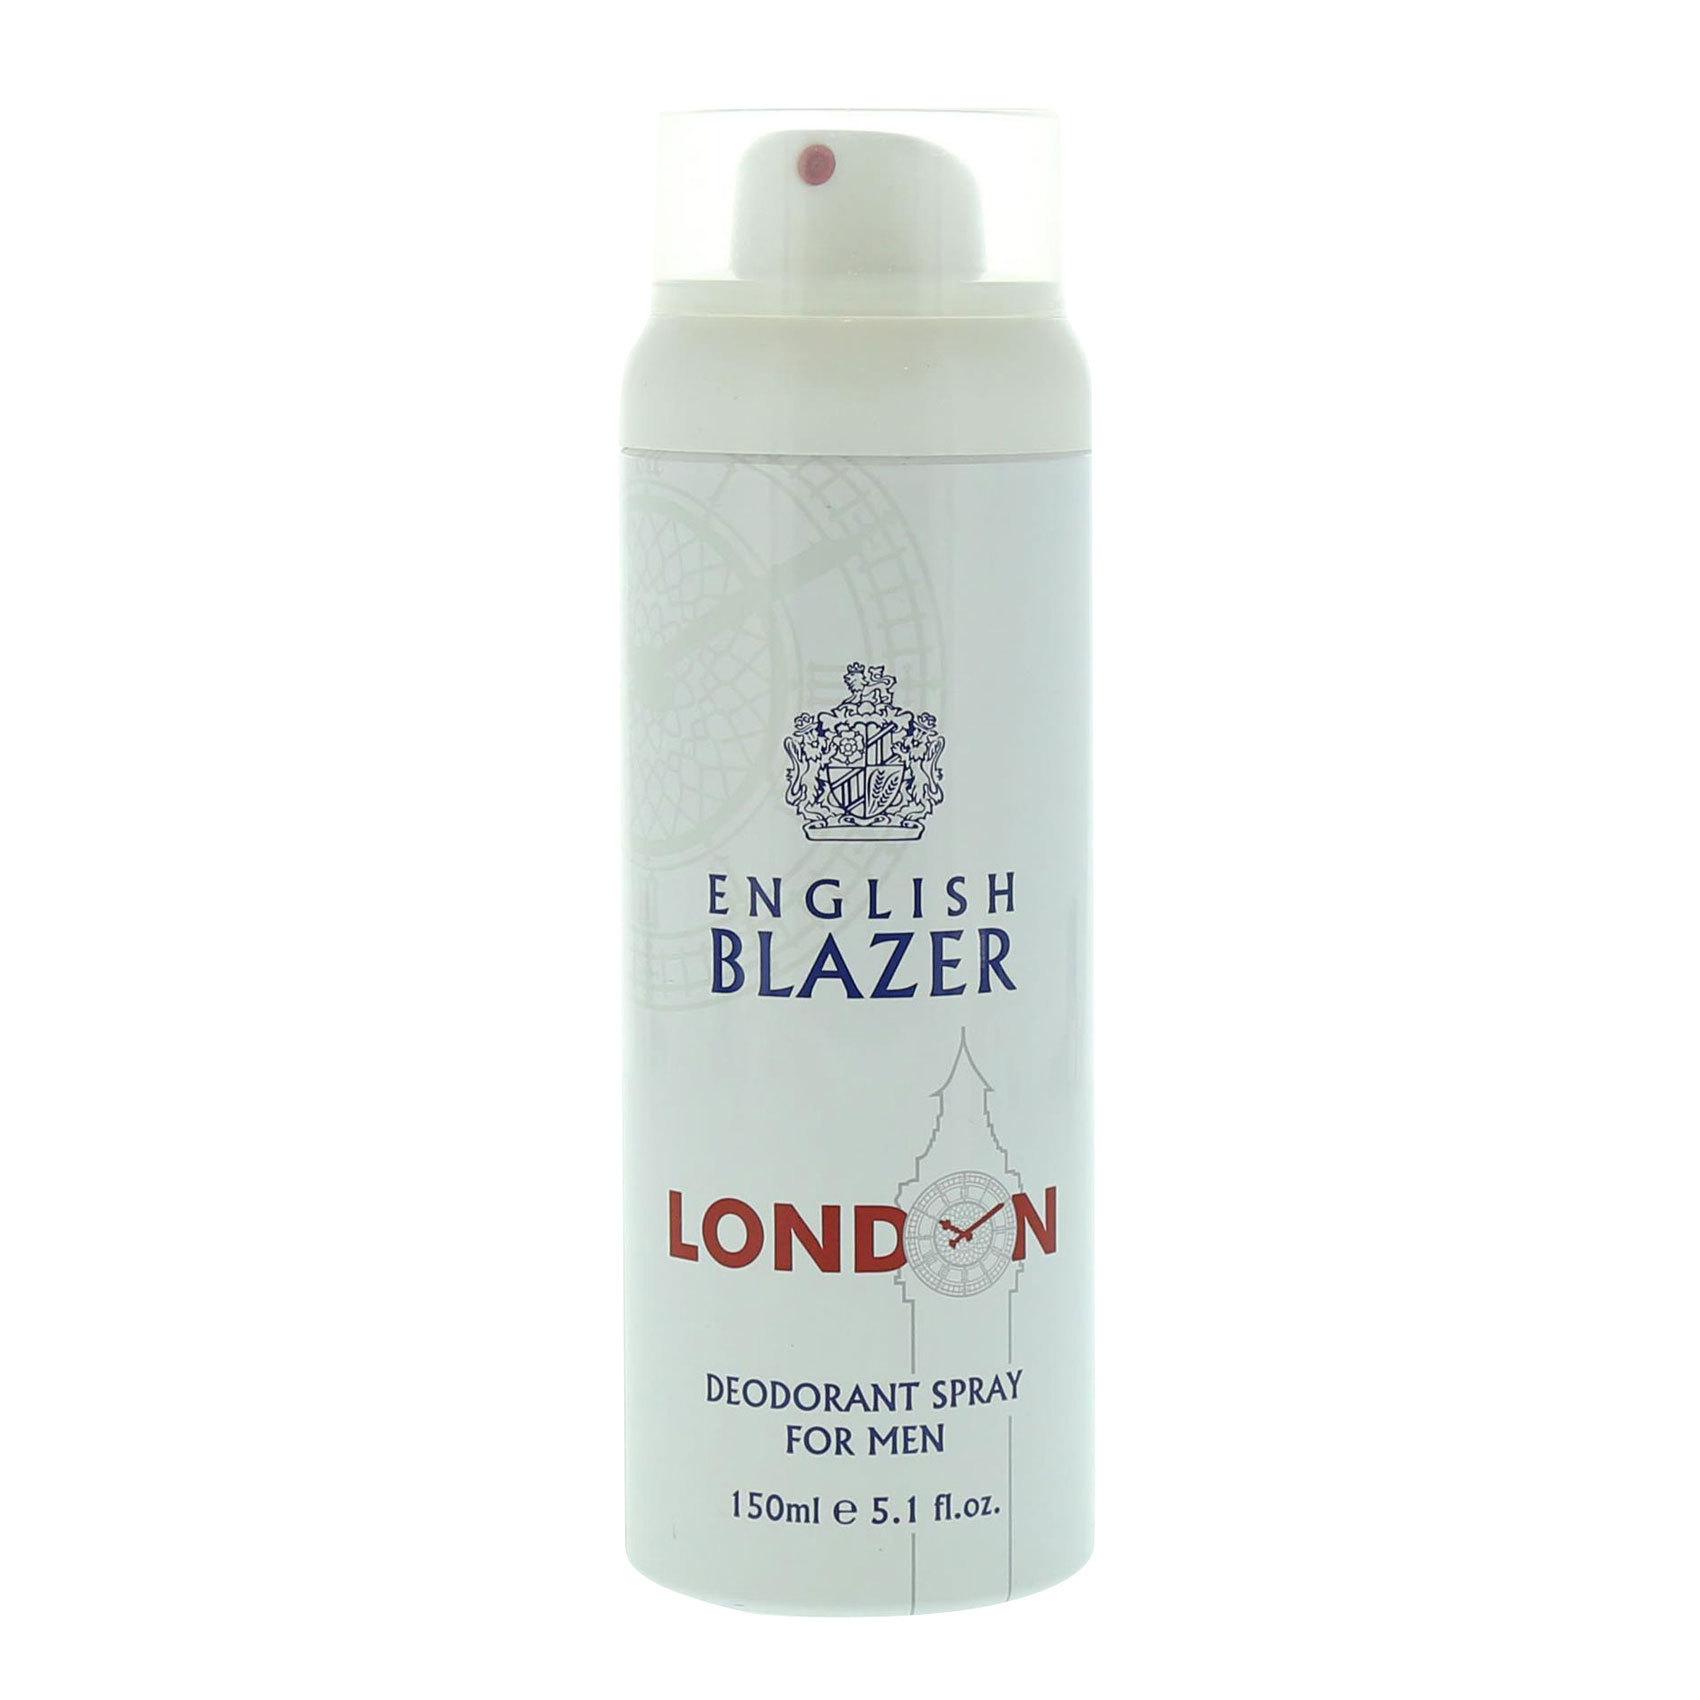 ENG.BLAZER LONDON DEOBODYSPRAY150ML